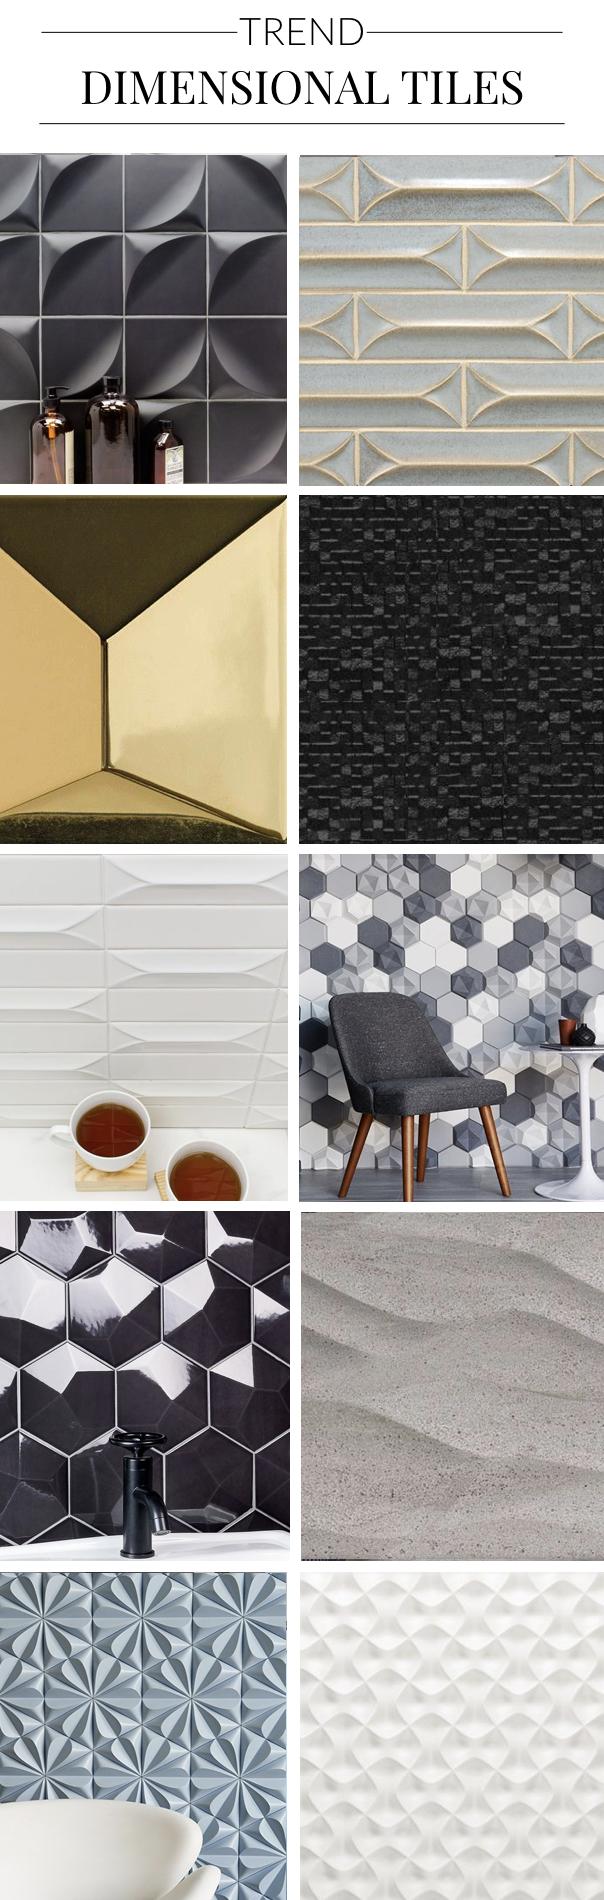 Dimensional Tiles1.001